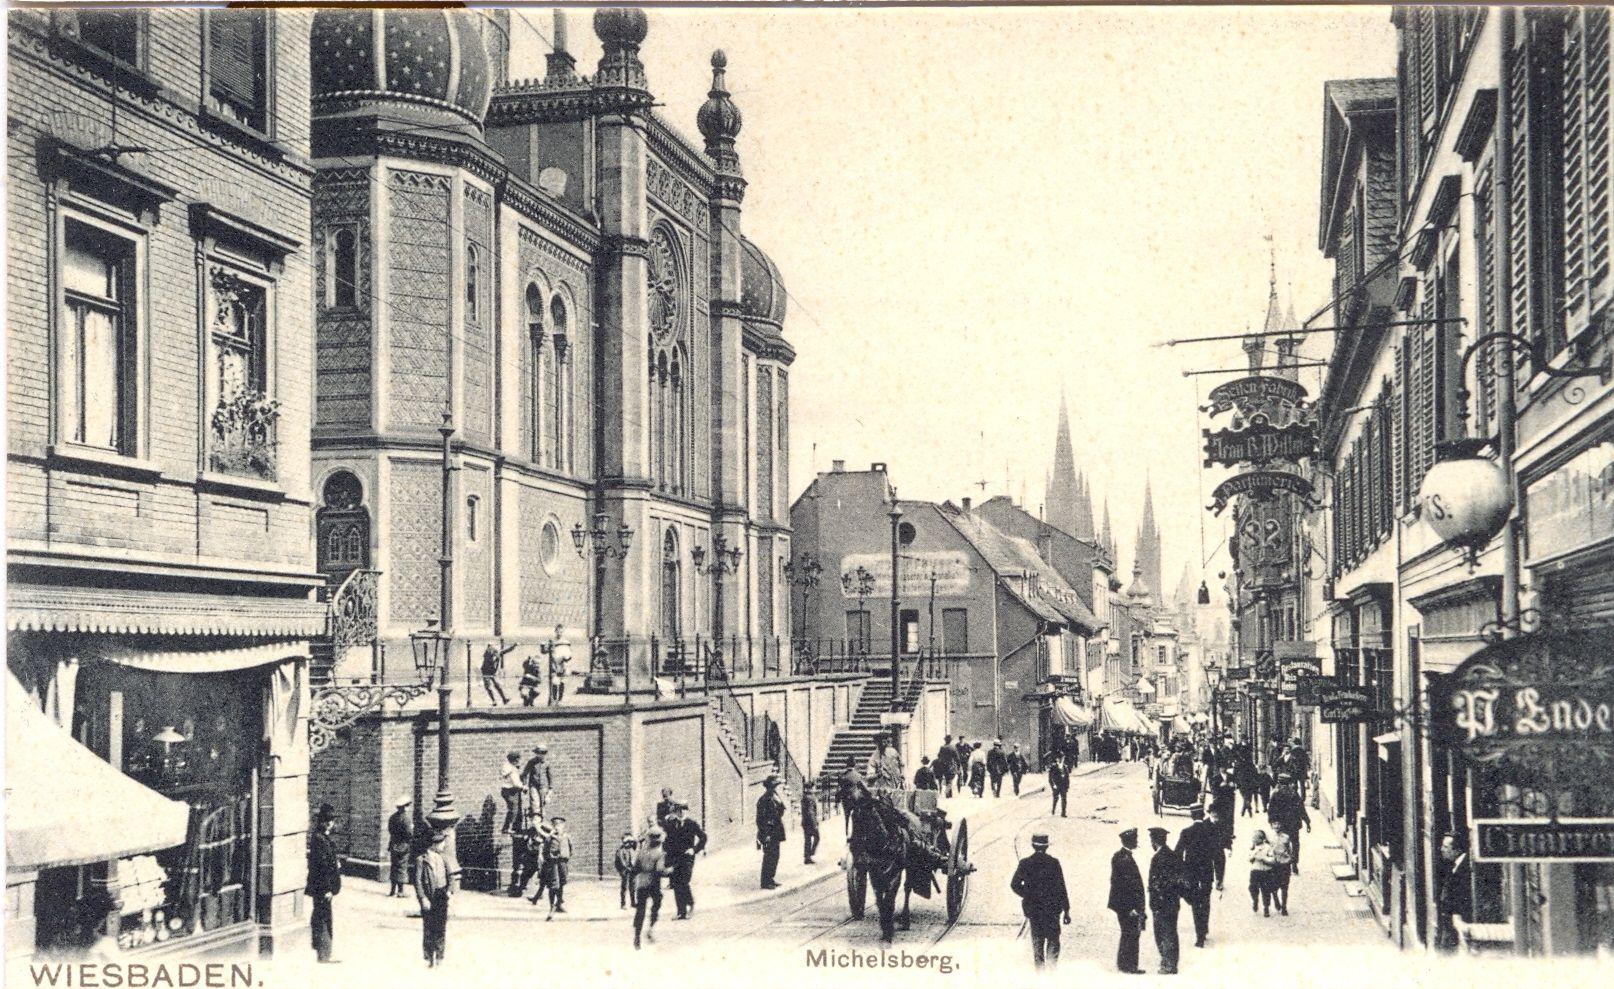 http://www.alemannia-judaica.de/images/Images%20361/Wiesbaden%20Synagoge%2014020.jpg